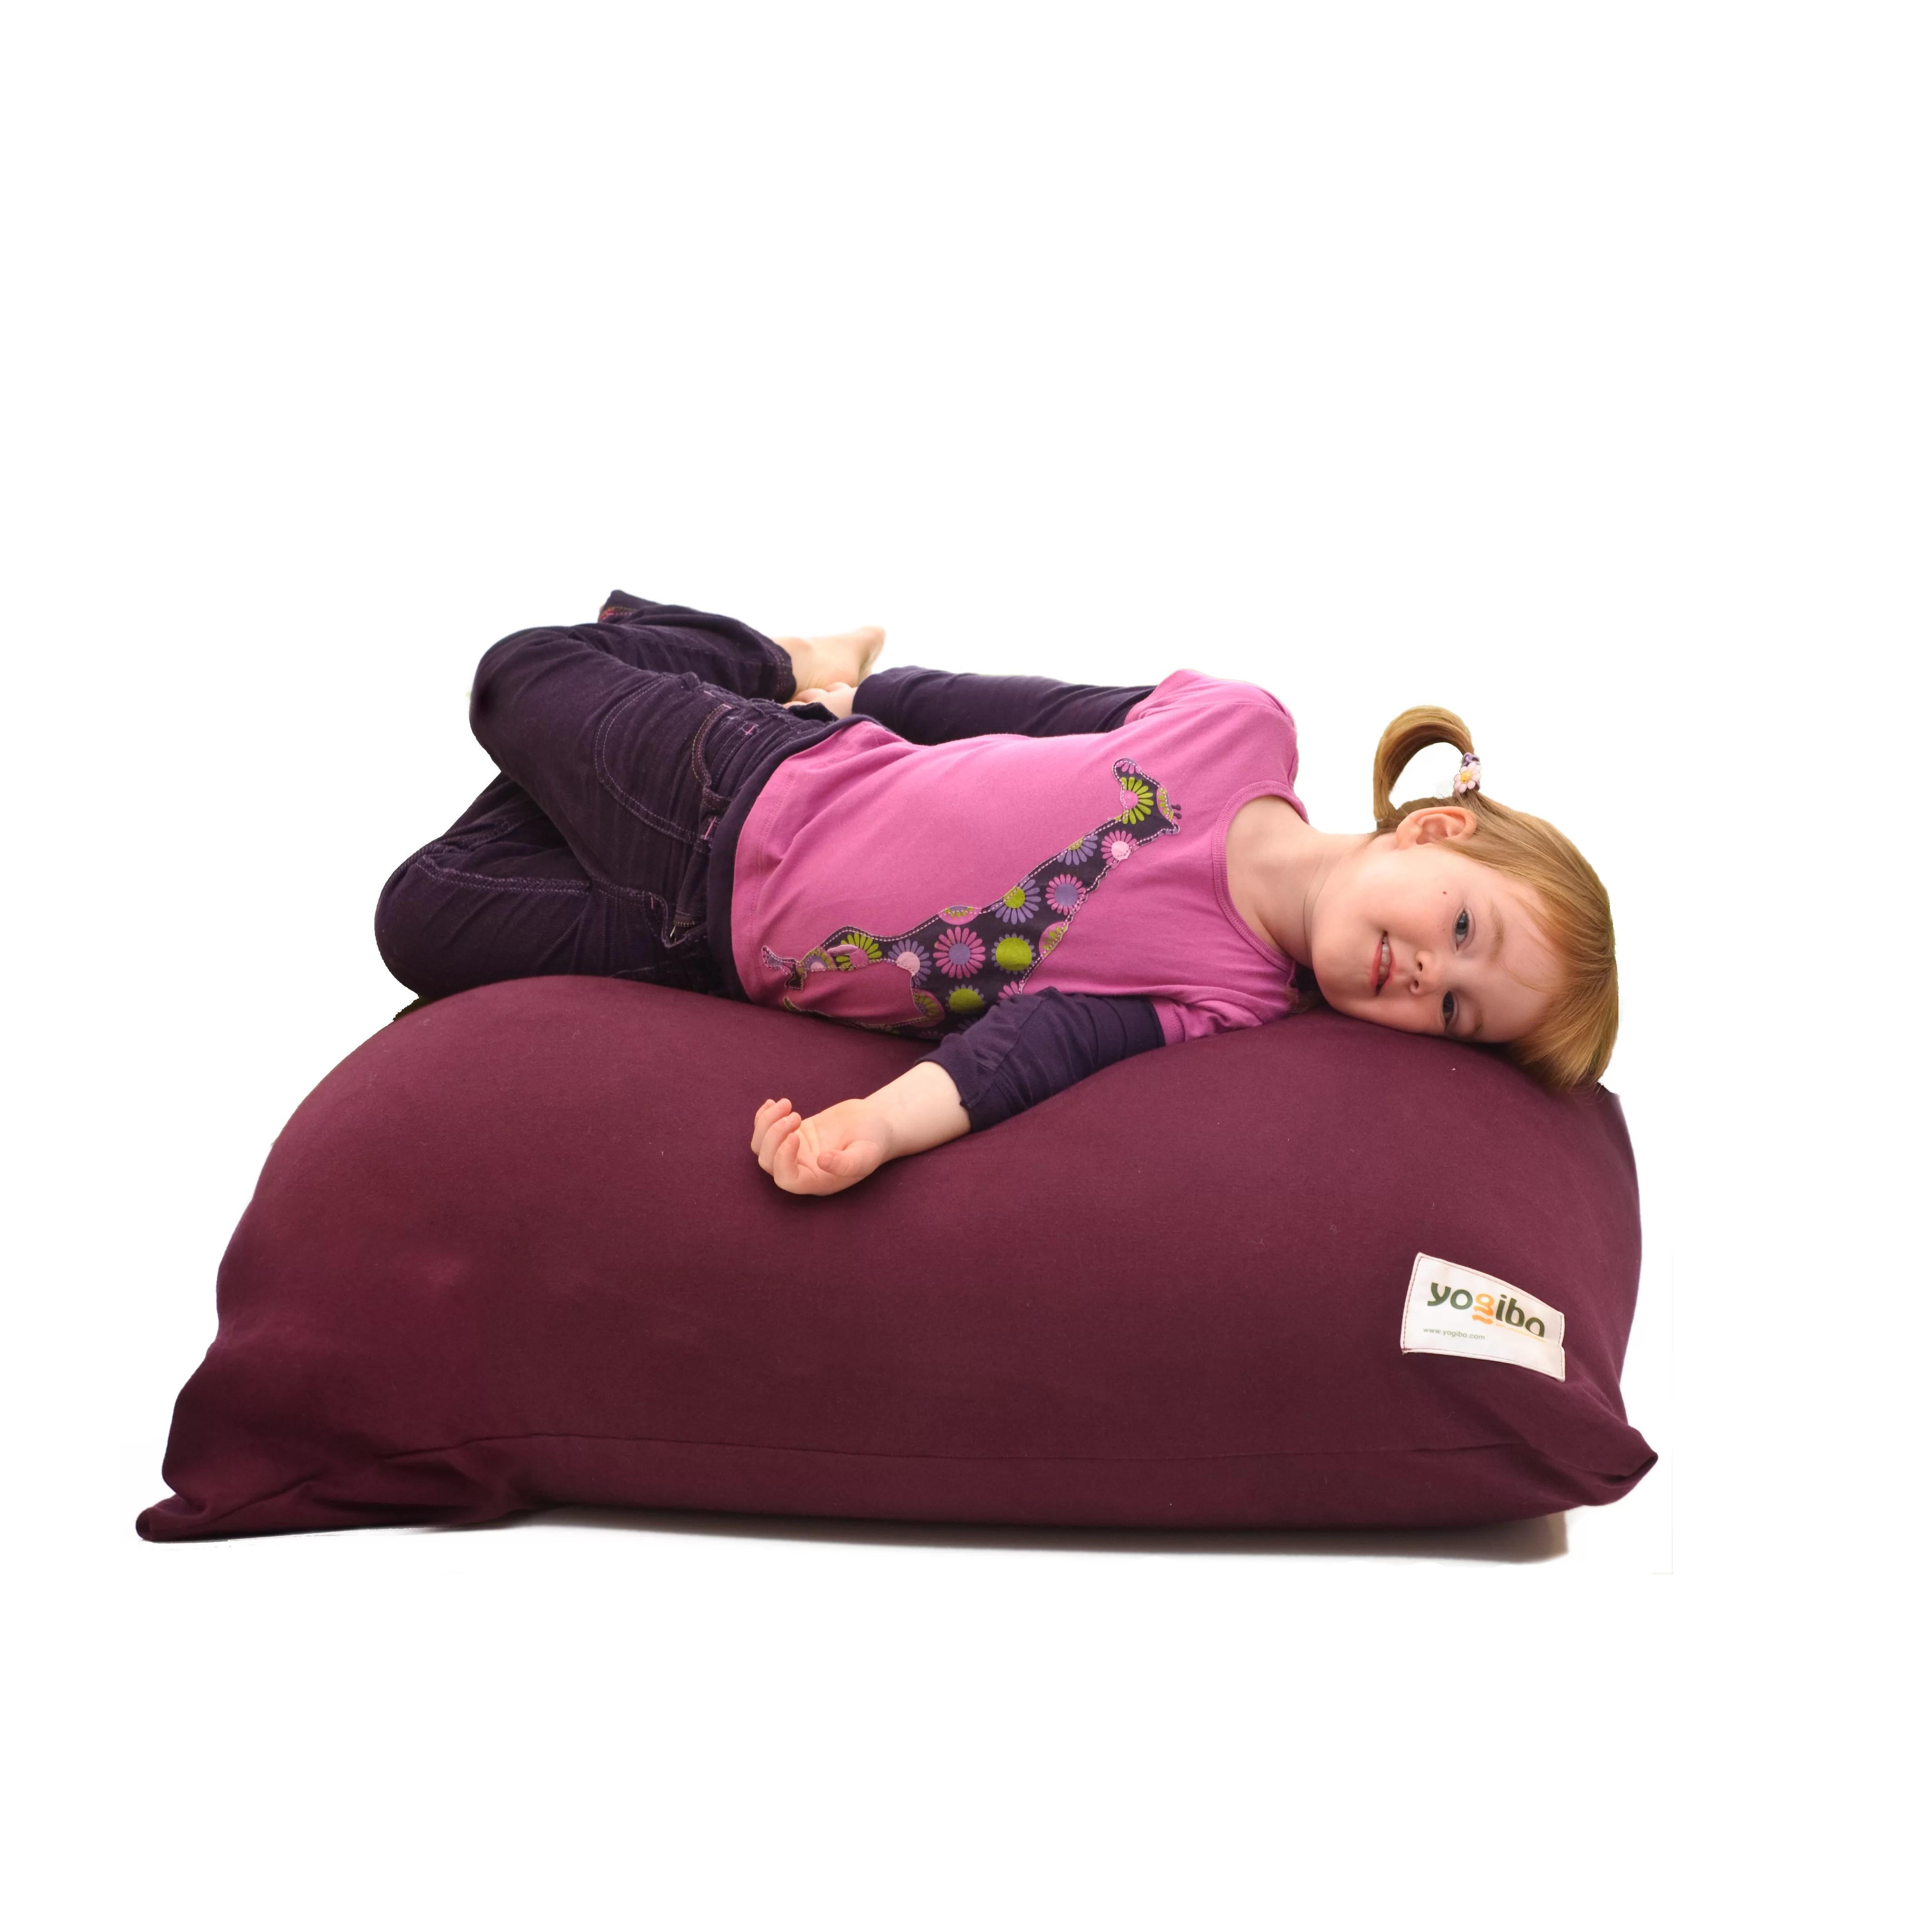 mini bean bag chair cheap black spandex covers for sale yogibo indoor and reviews wayfair